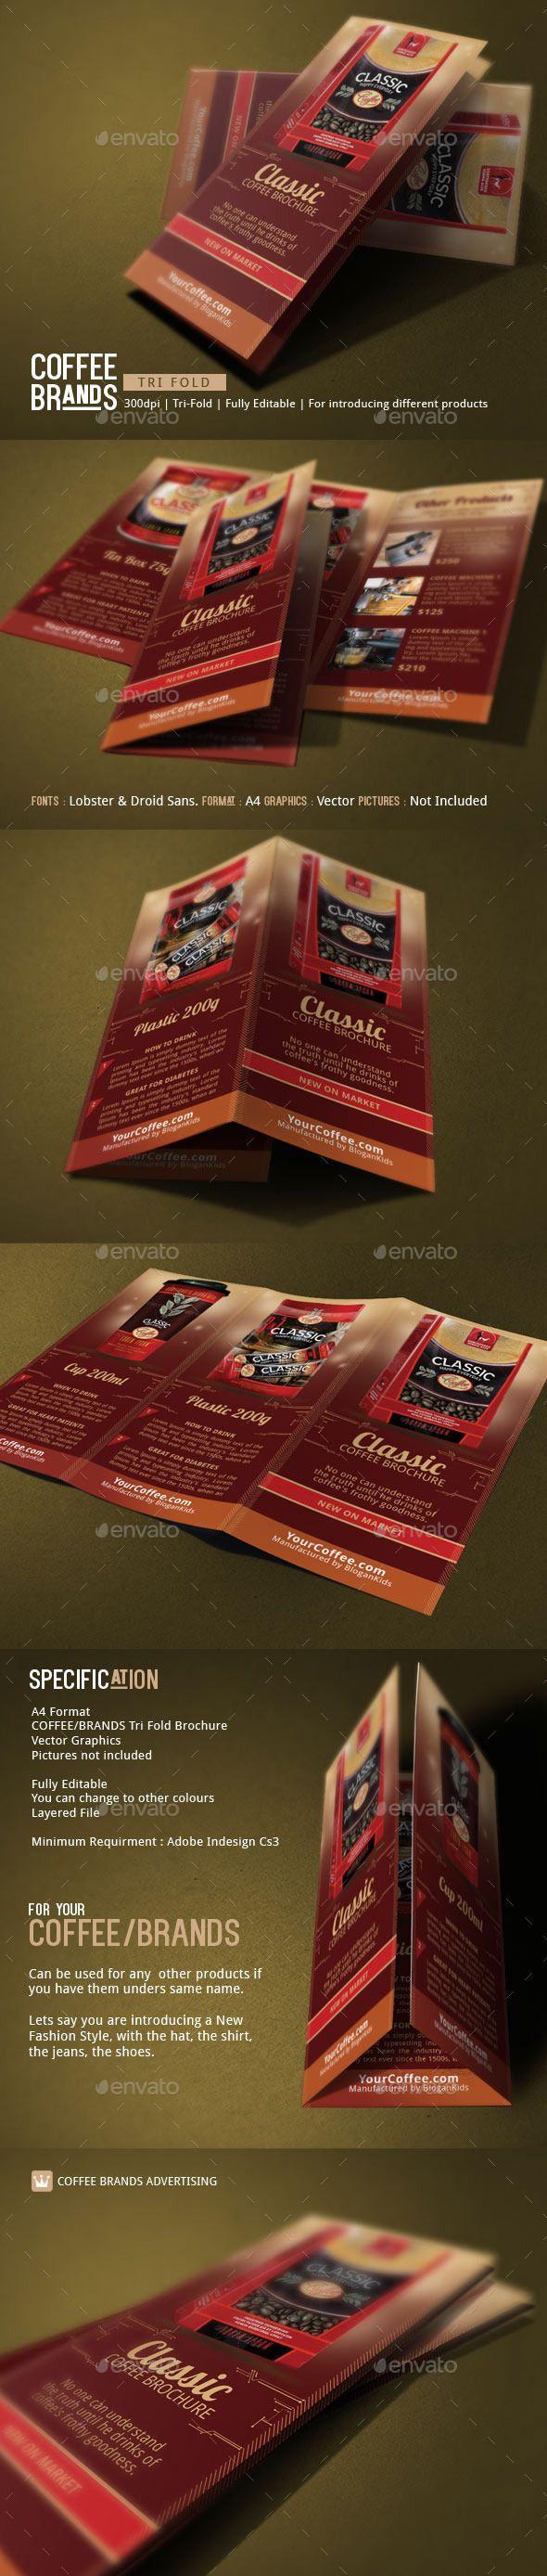 Coffee Brands Brochure Template